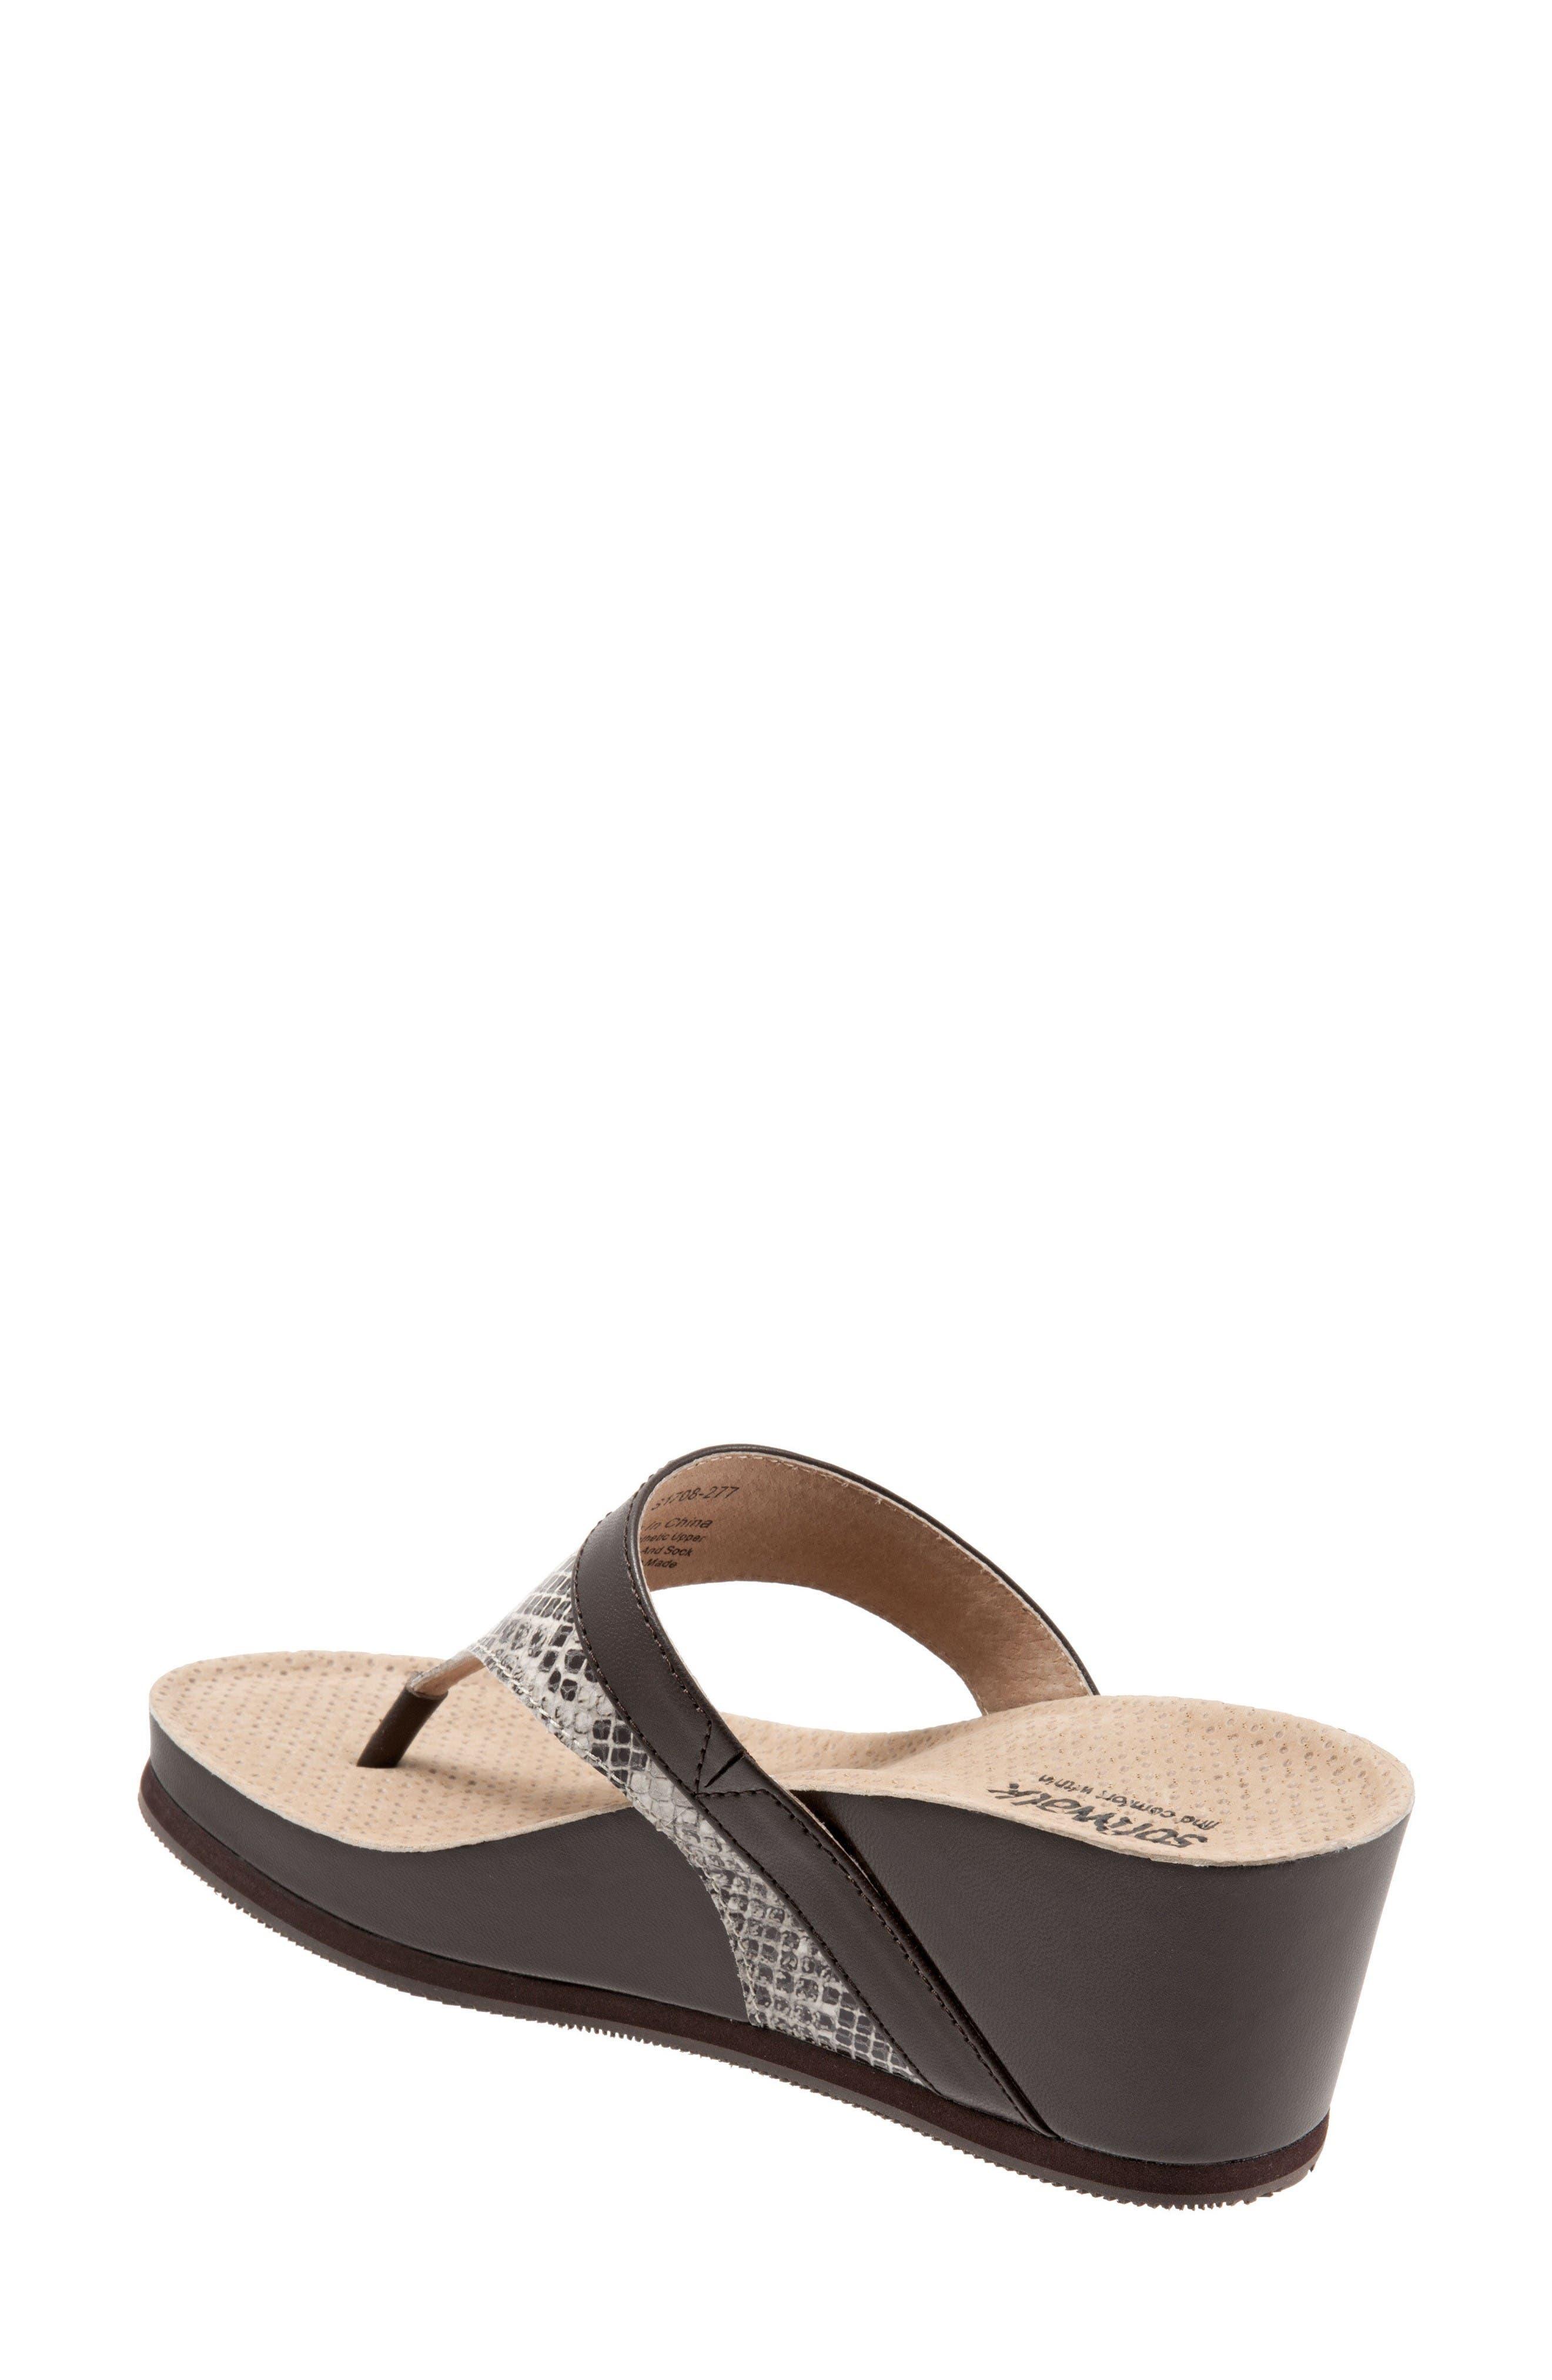 Heights Wedge Slide Sandal,                             Alternate thumbnail 2, color,                             Brown Leather